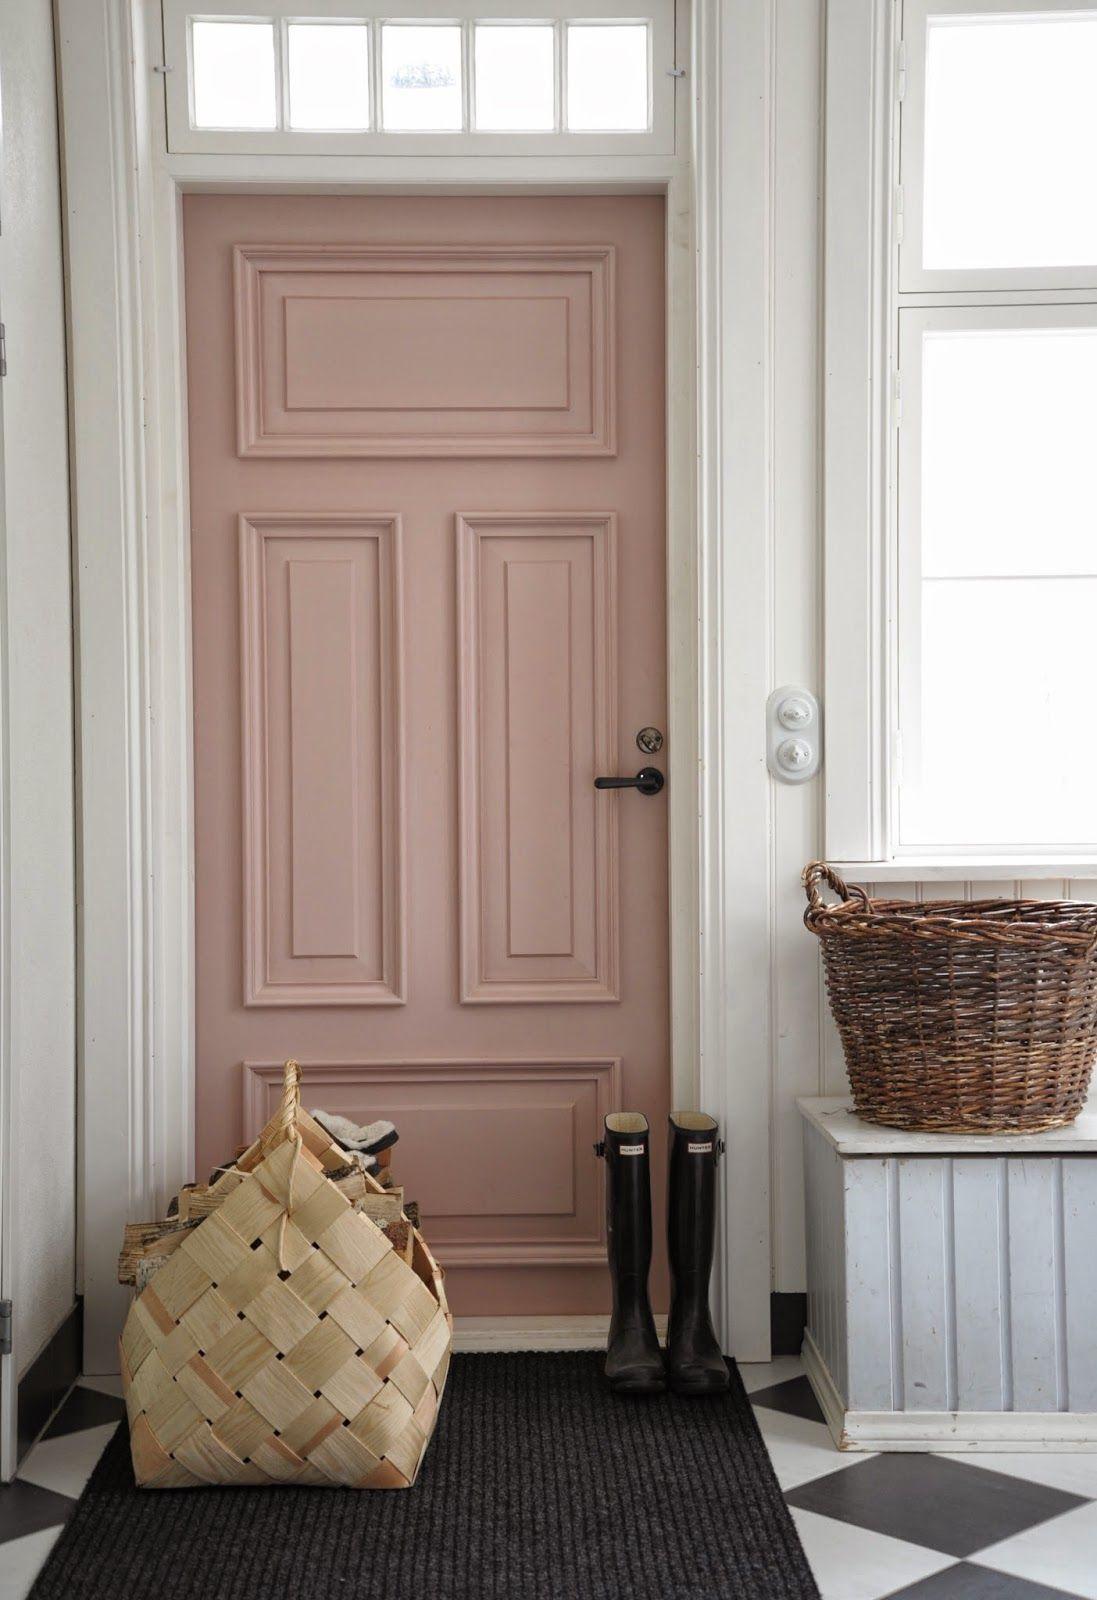 Bon Rose Door Inside Home With Tiled Black And White Floors // Porte Rose  Poudré Pastel